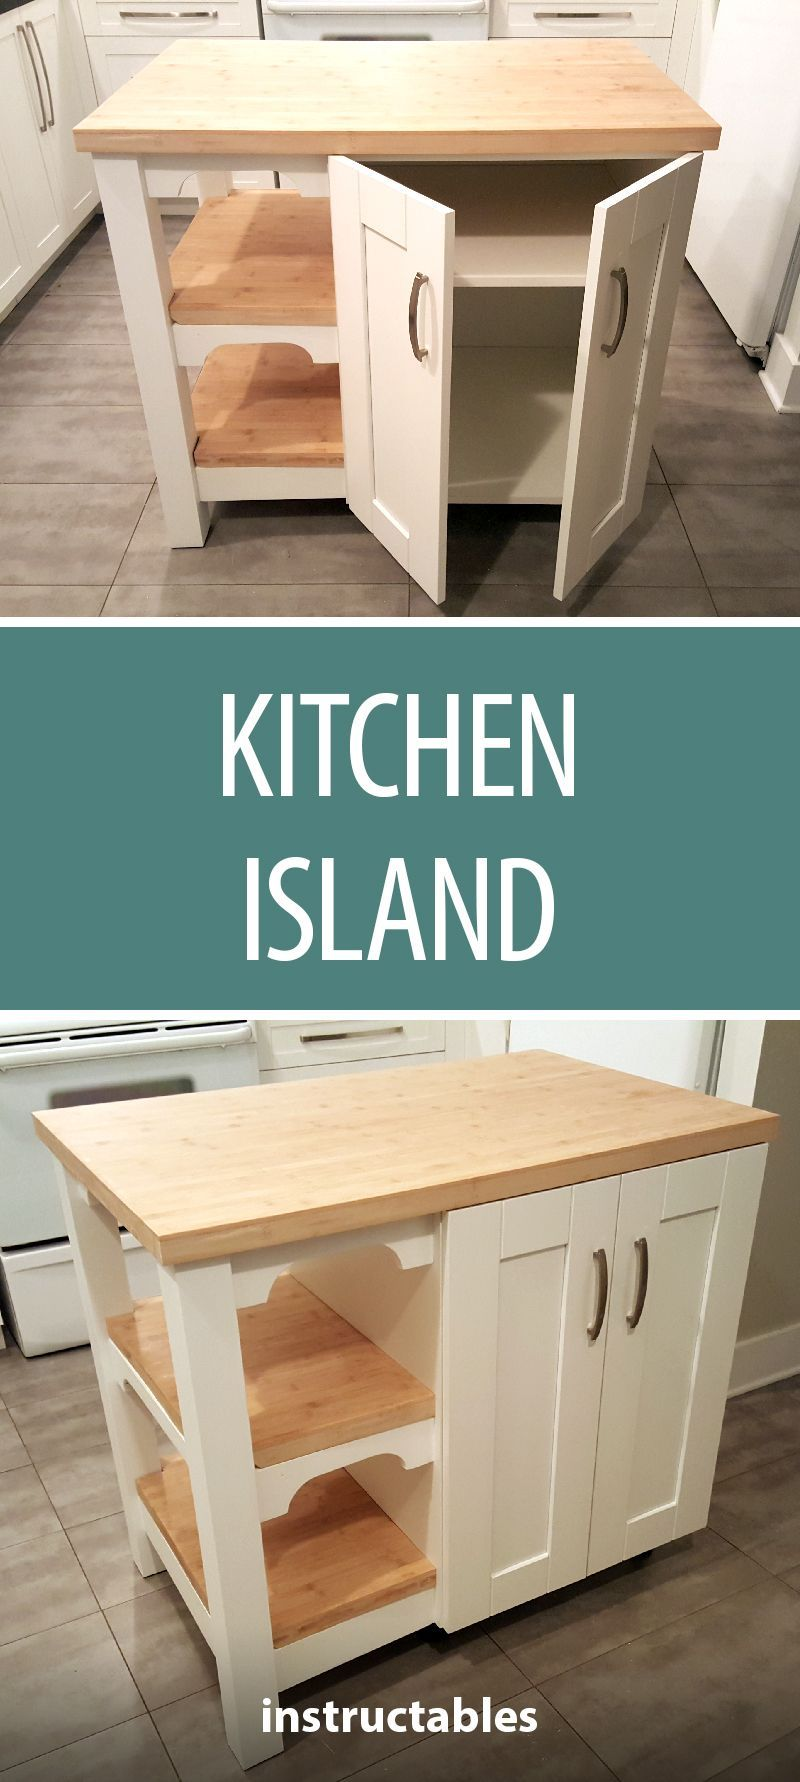 Kitchen Island Prefab Kitchen Cabinets Kitchen Remodel Cost Custom Kitchen Island